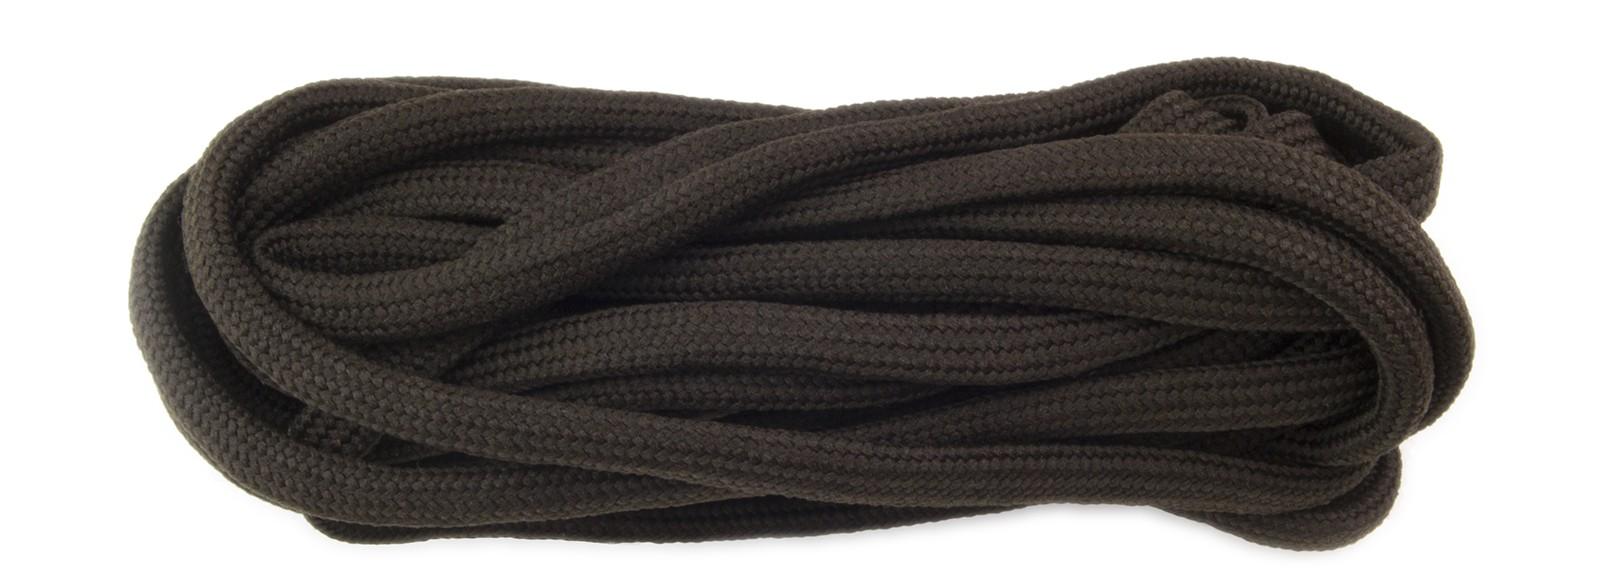 Dark Brown Dm Yeezy 75cm